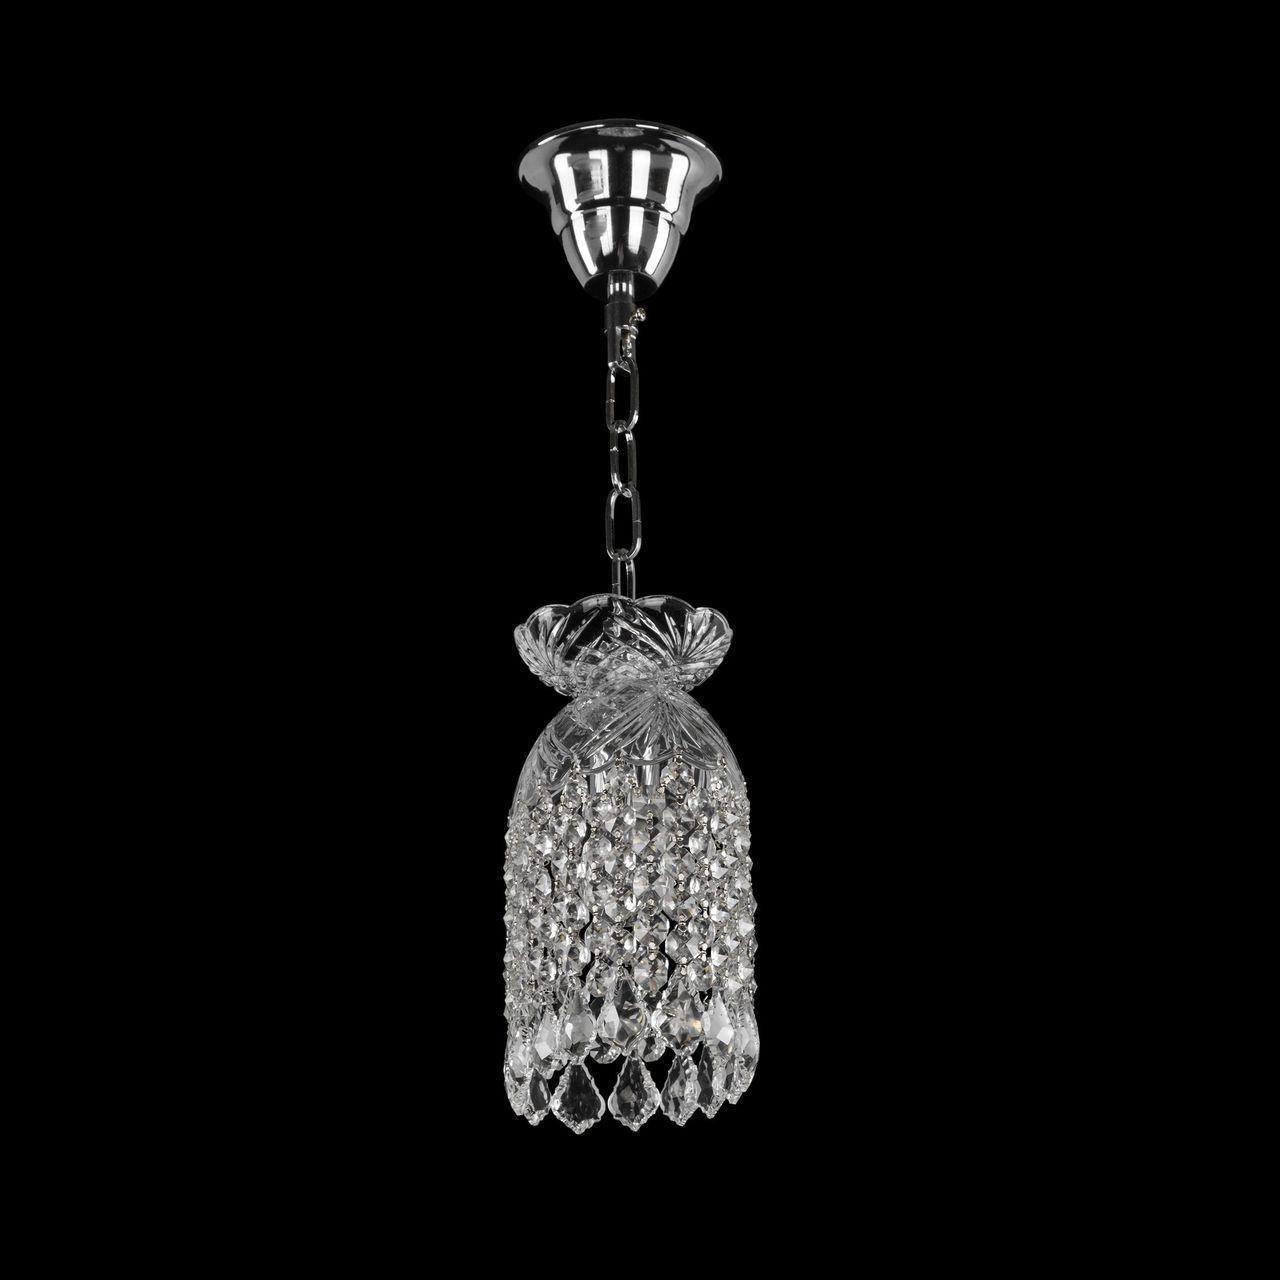 Подвесной светильник Bohemia Ivele 14783/16 Ni Leafs